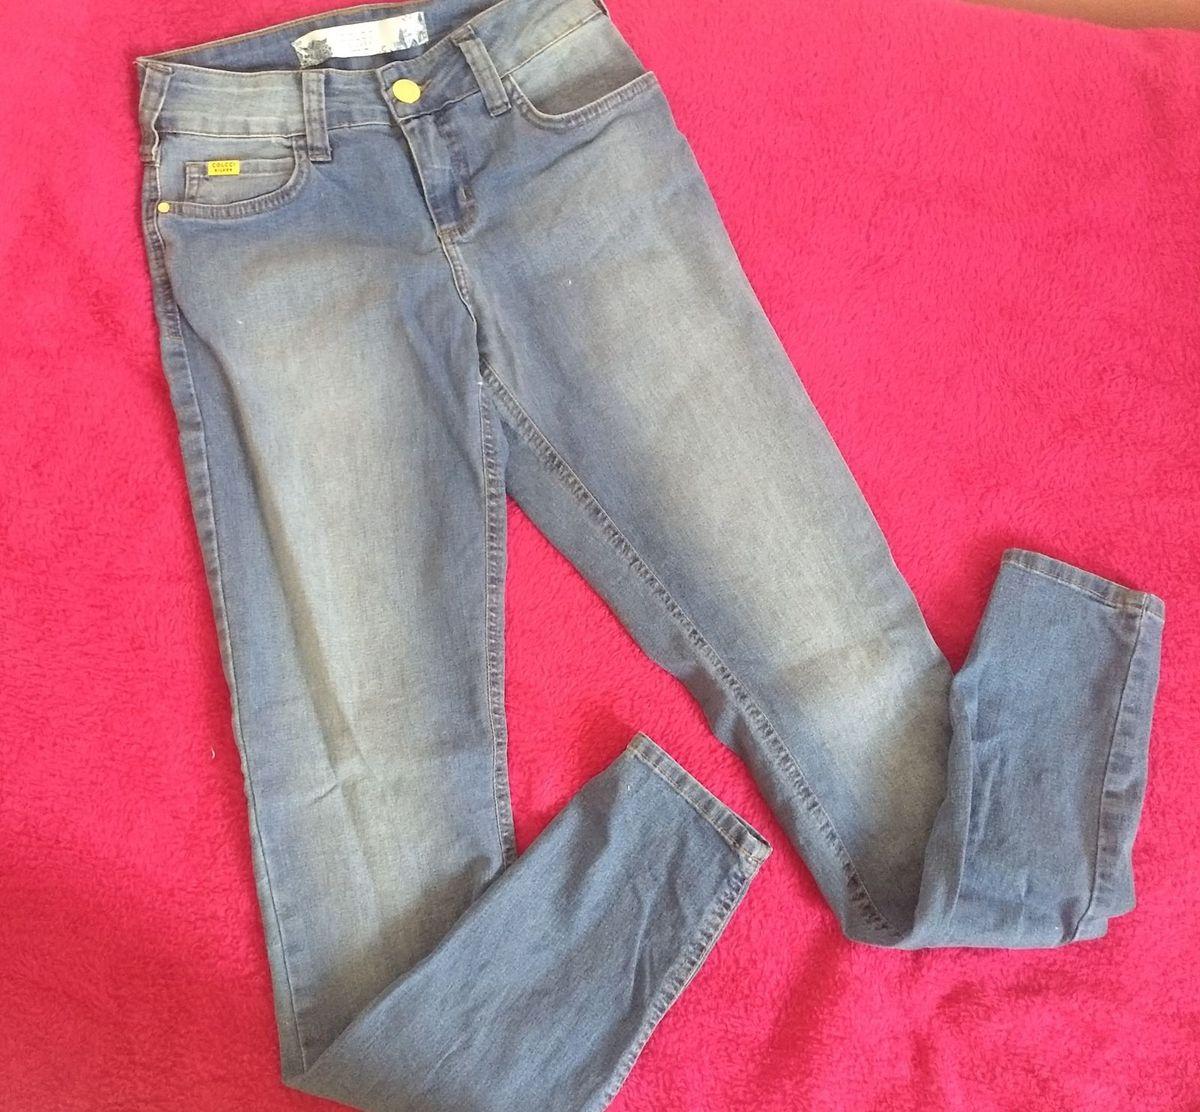 calça jeans colcci - calças colcci.  Czm6ly9wag90b3muzw5qb2vplmnvbs5ici9wcm9kdwn0cy85nju1odk5l2e4n2uxzwrhyjjkndgxmweyotlmztm2mdm0mze4othklmpwzw  ... e8411c6da04